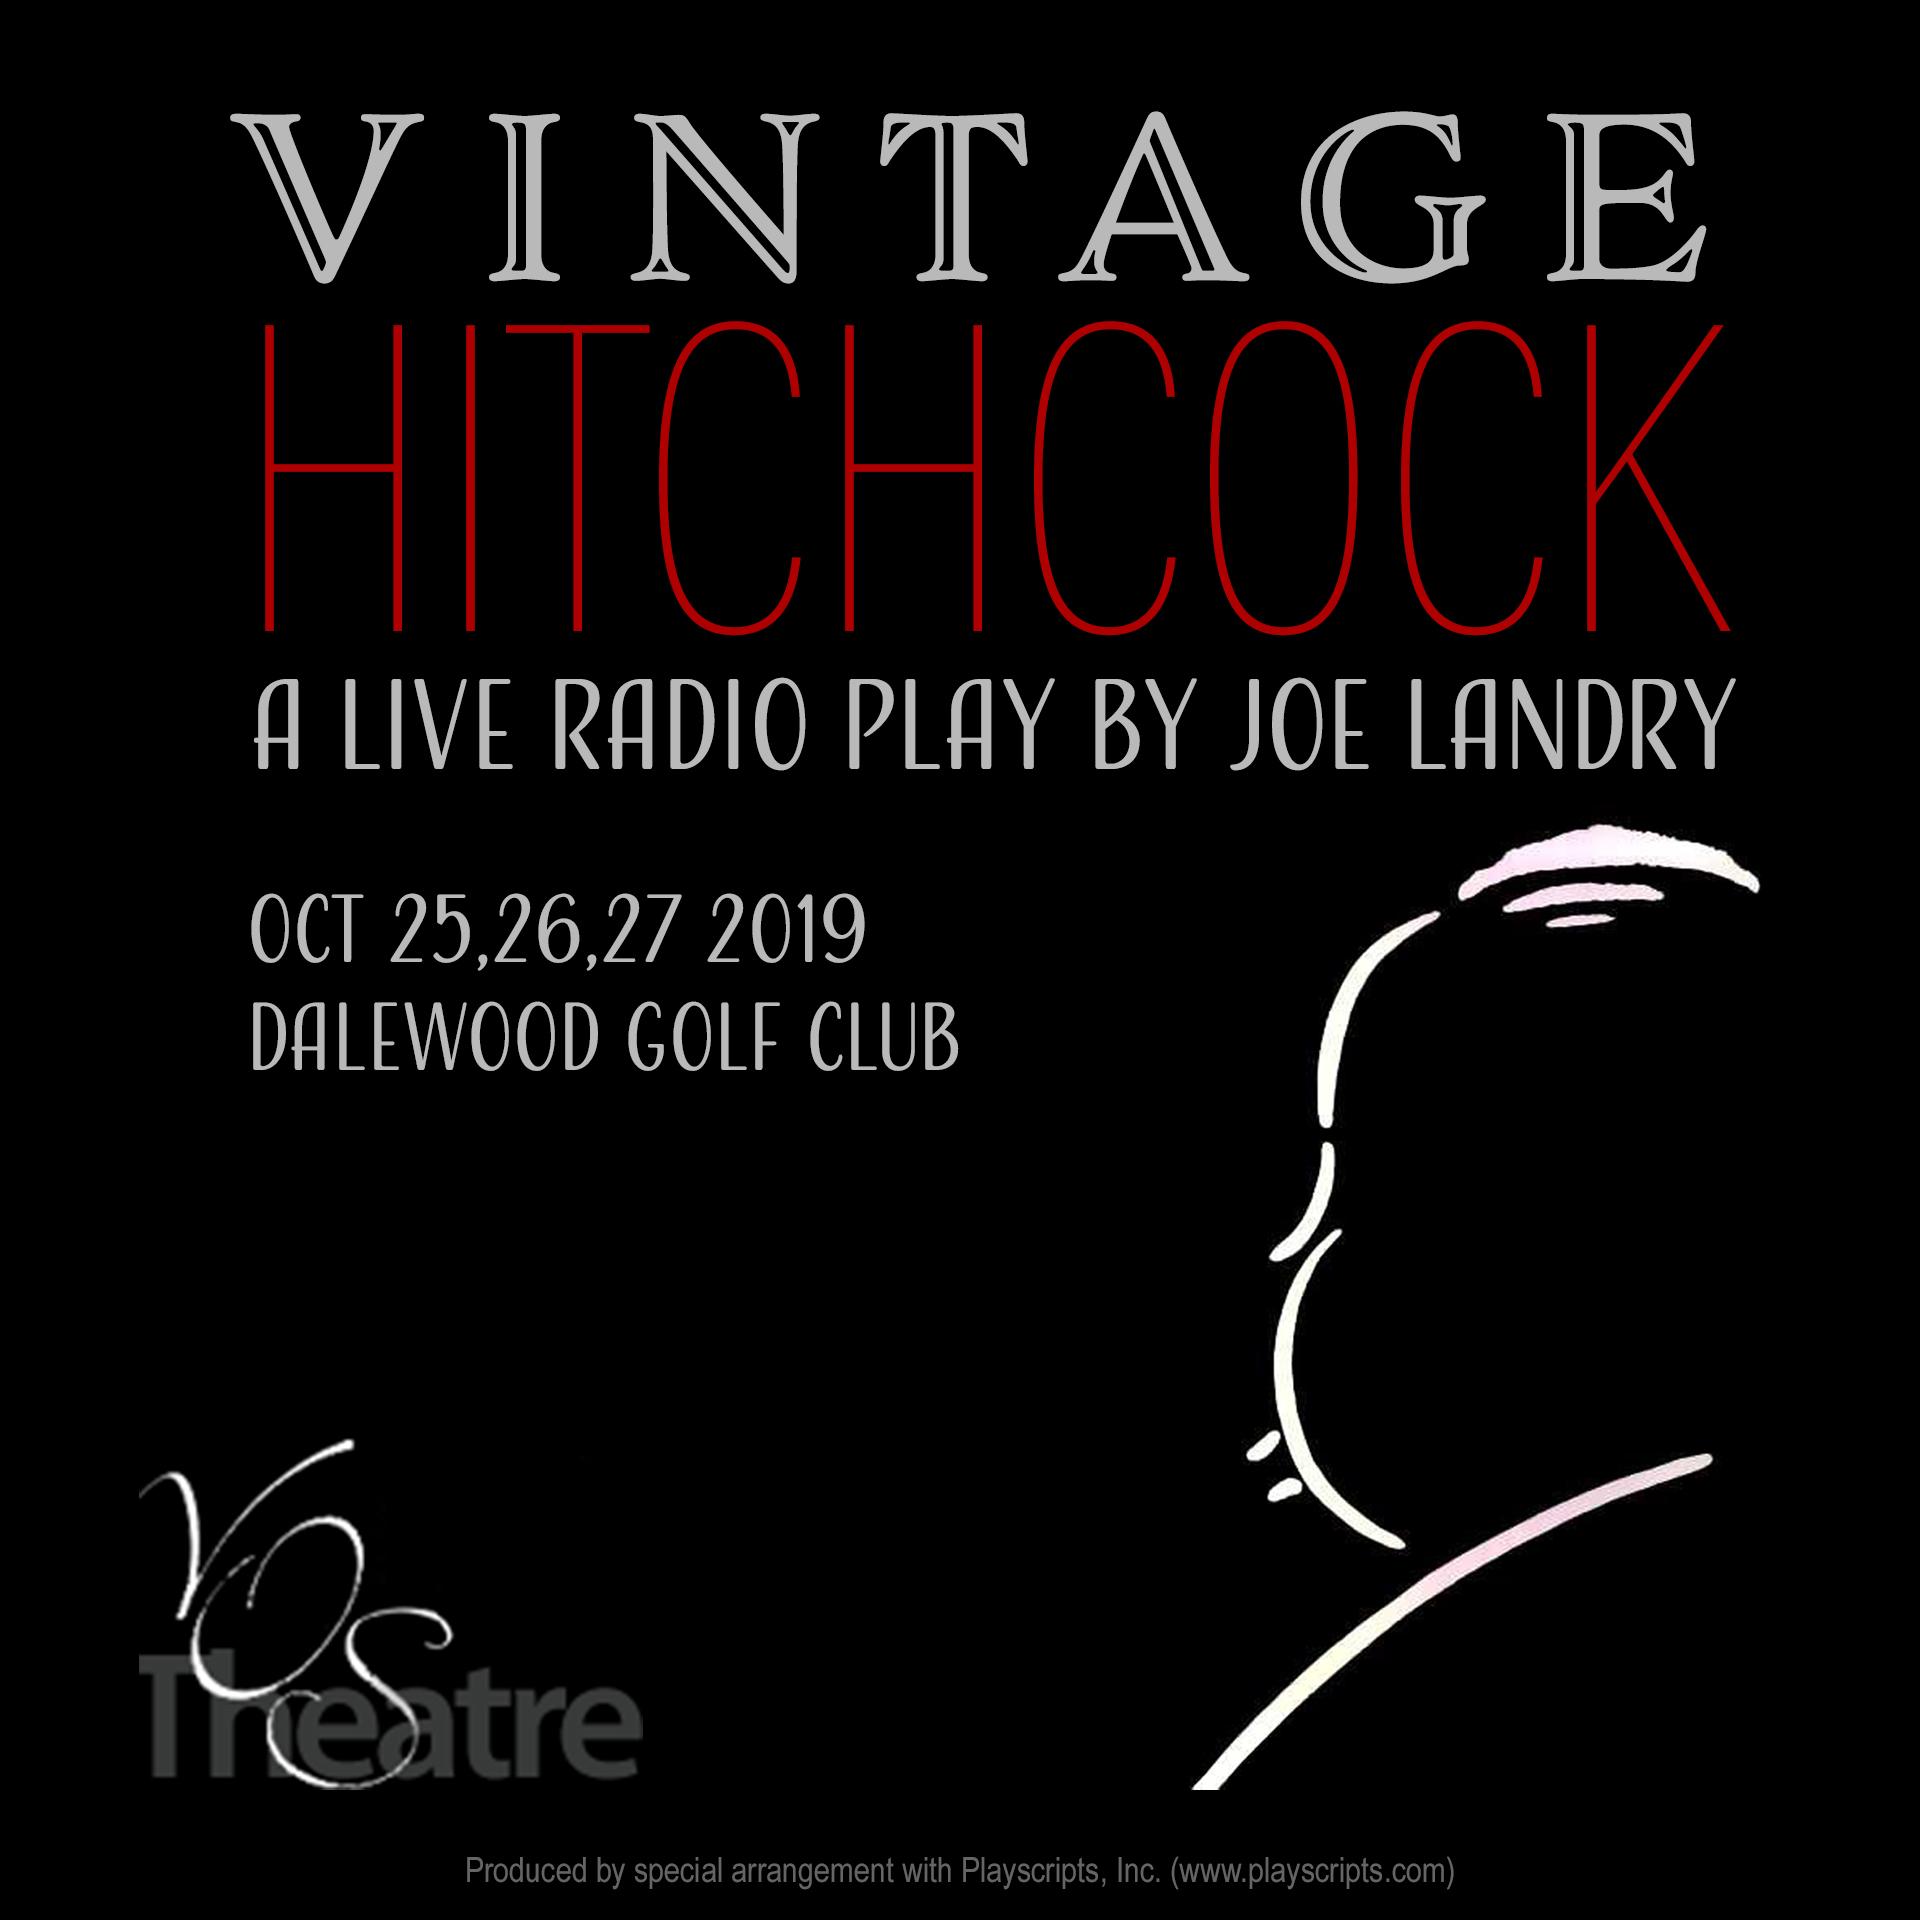 Vintage Hitchcock - A Live Radio Play